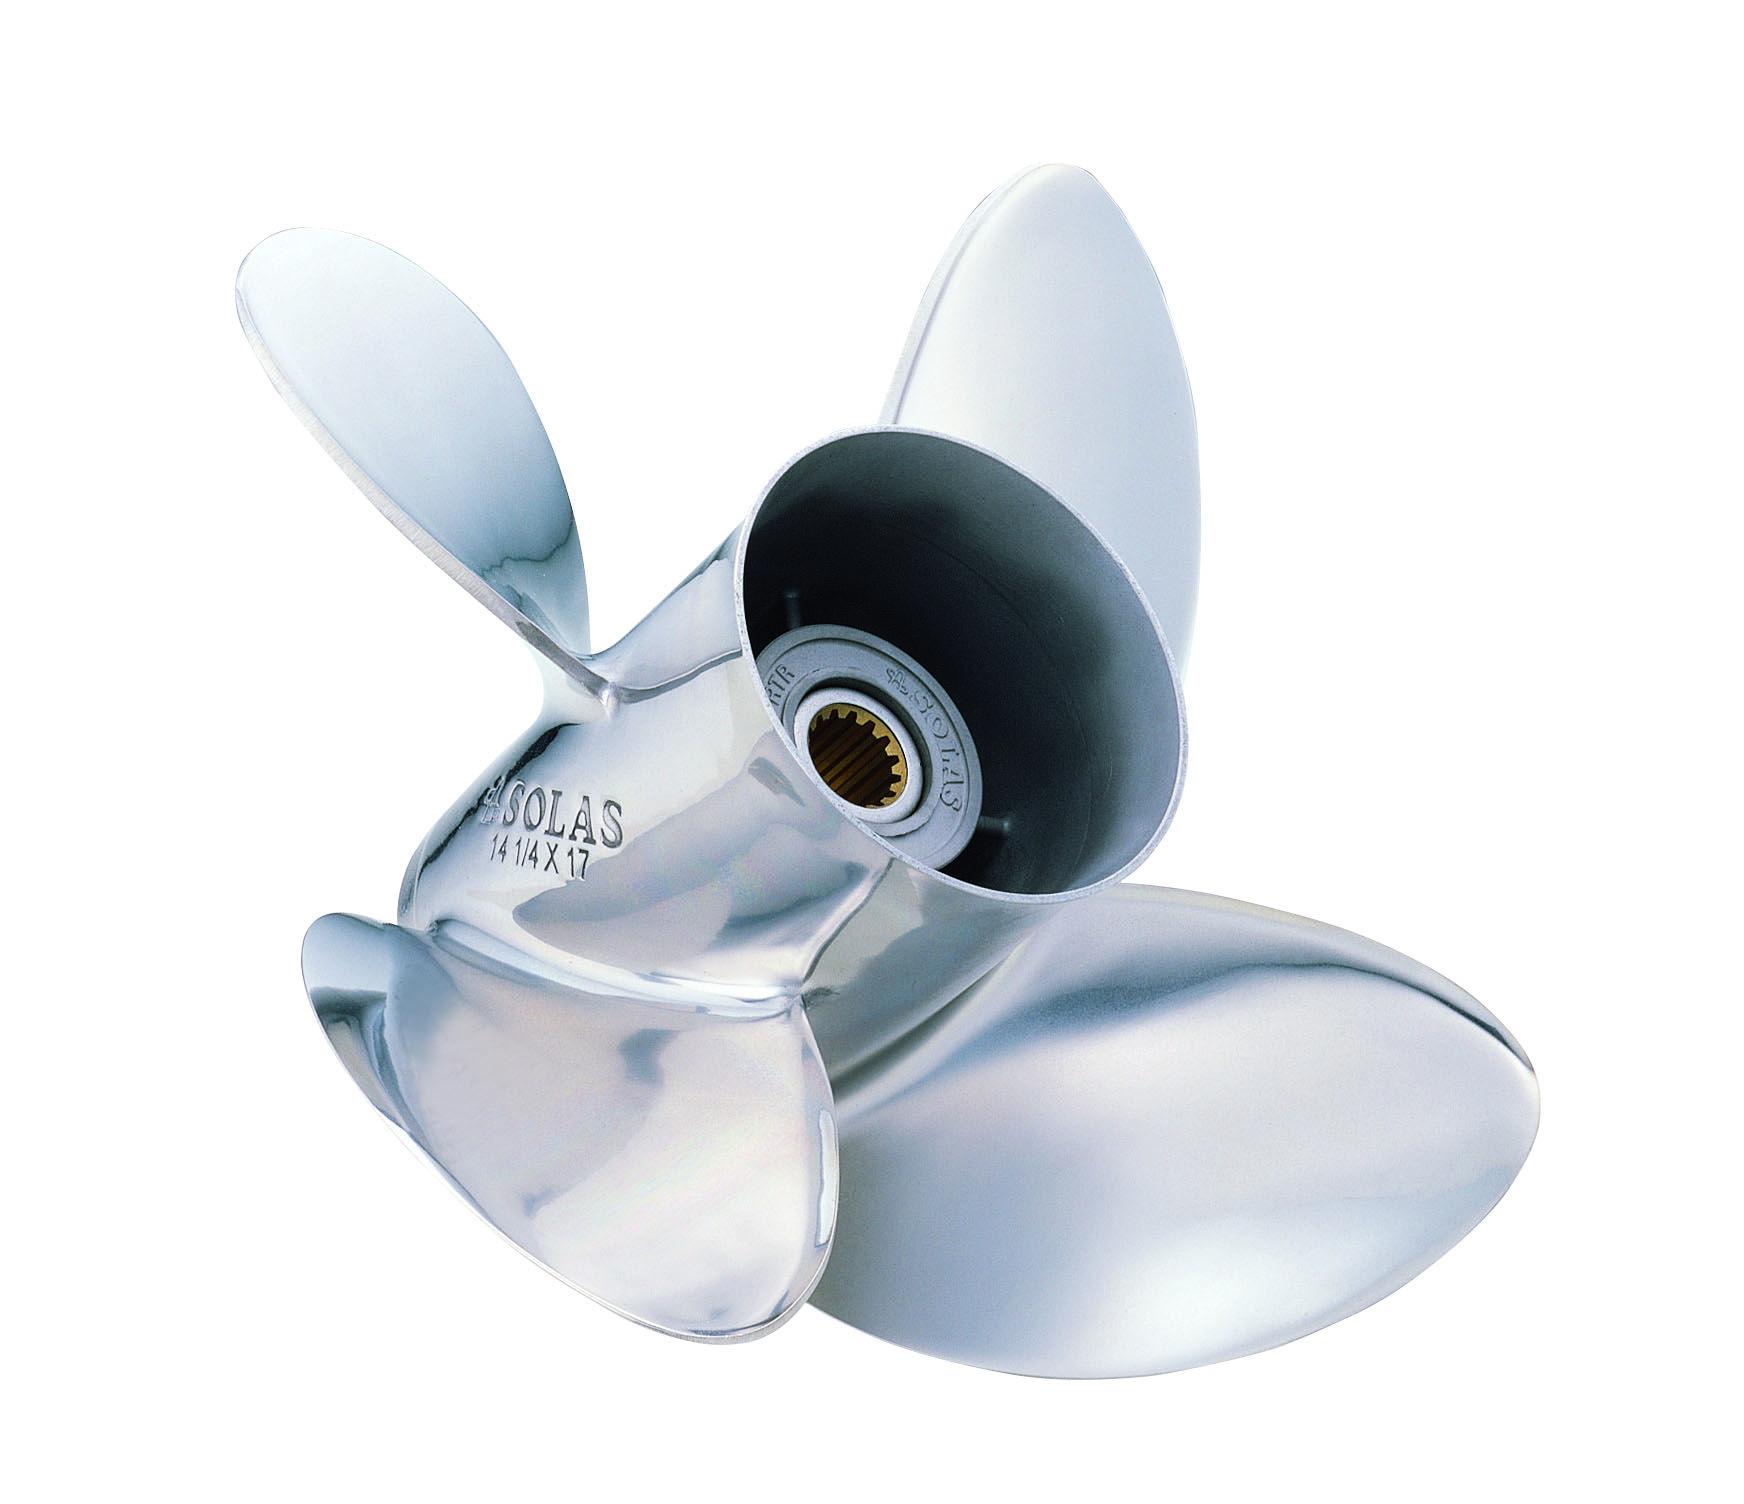 Solas 14 5 x 17 | Boat Propellers | Boat propellers, Boat